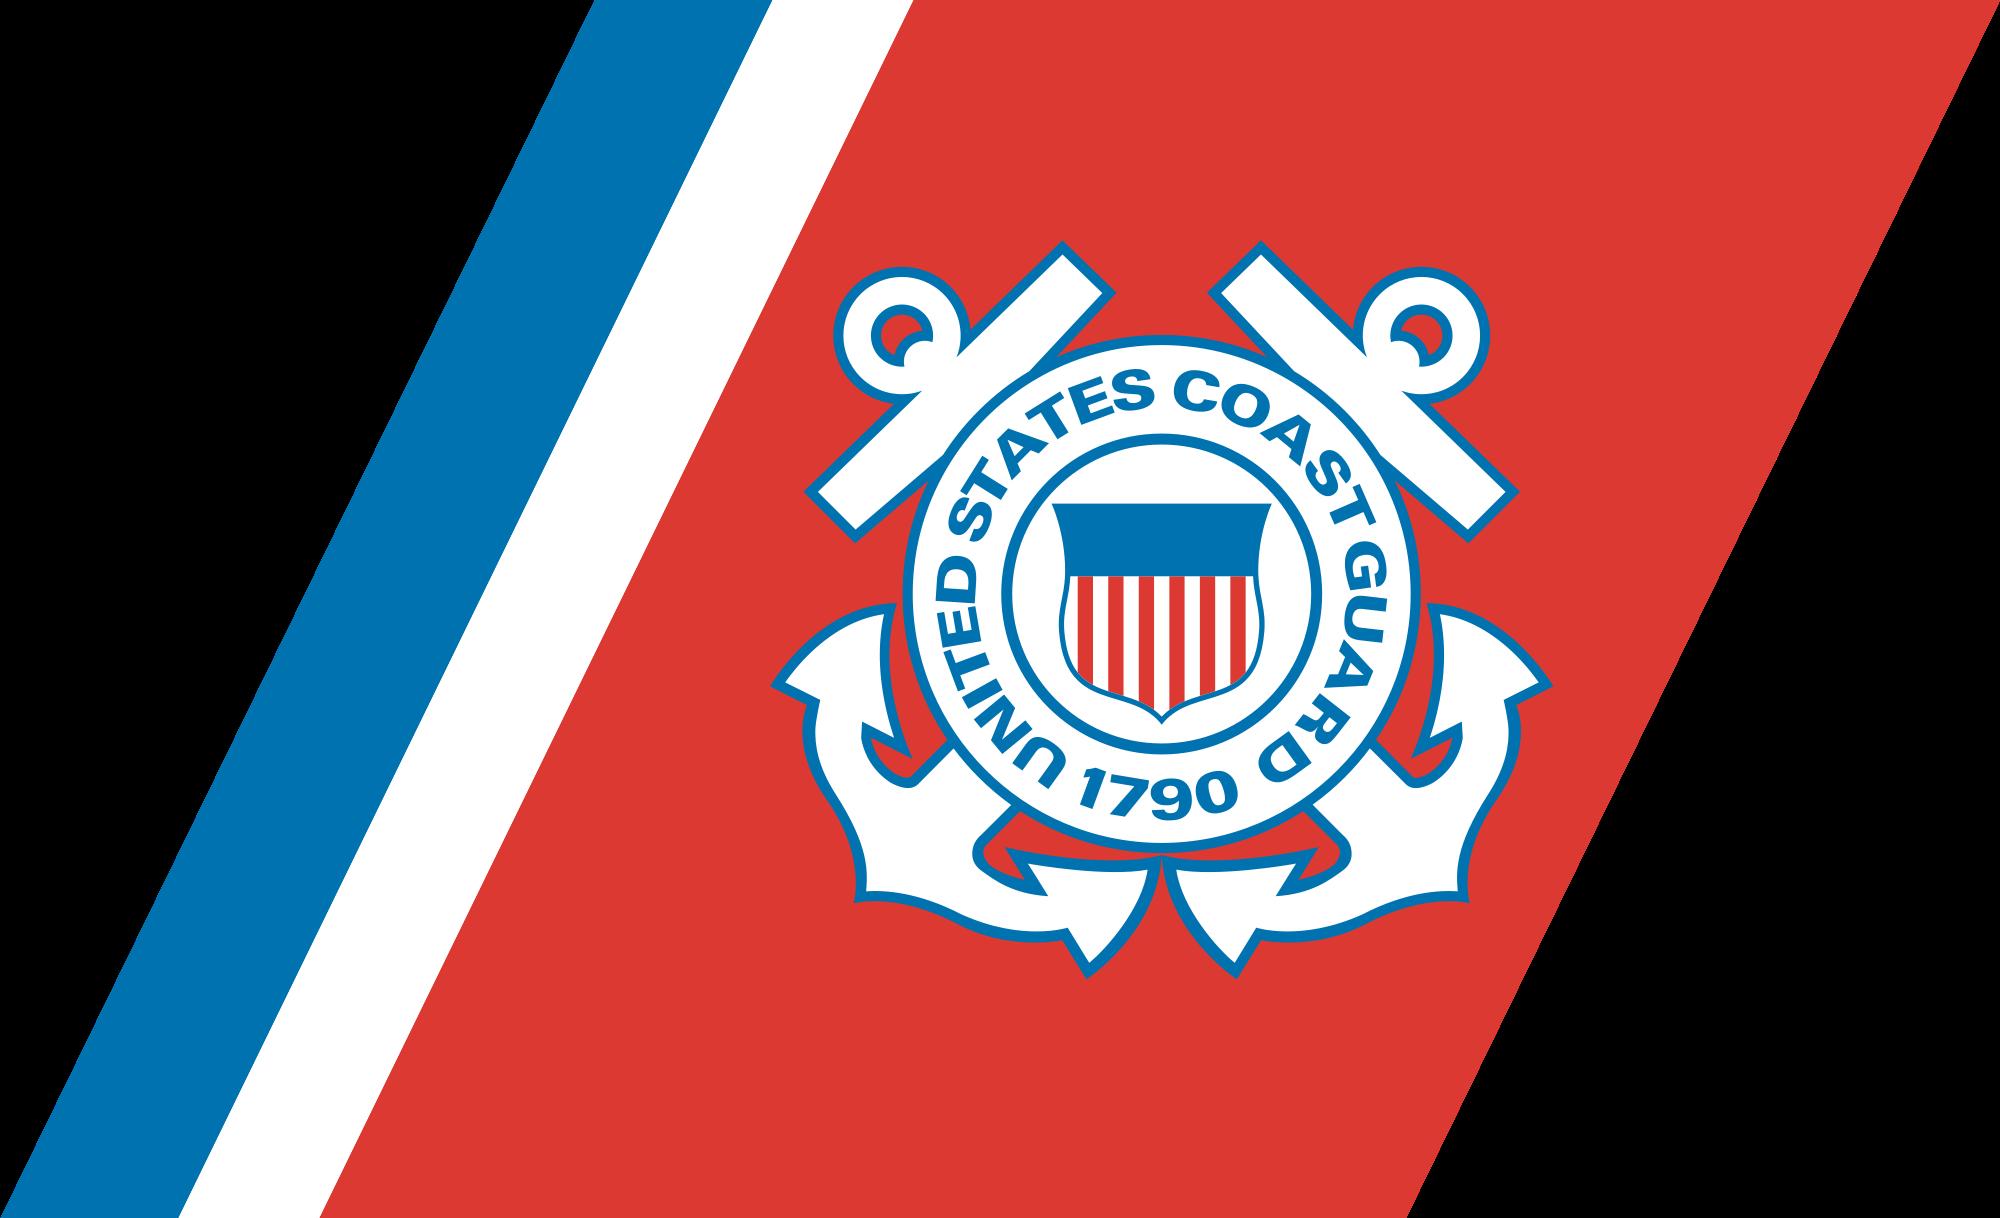 Sailor clipart uniform coast guard. Loewy designed racing stripe